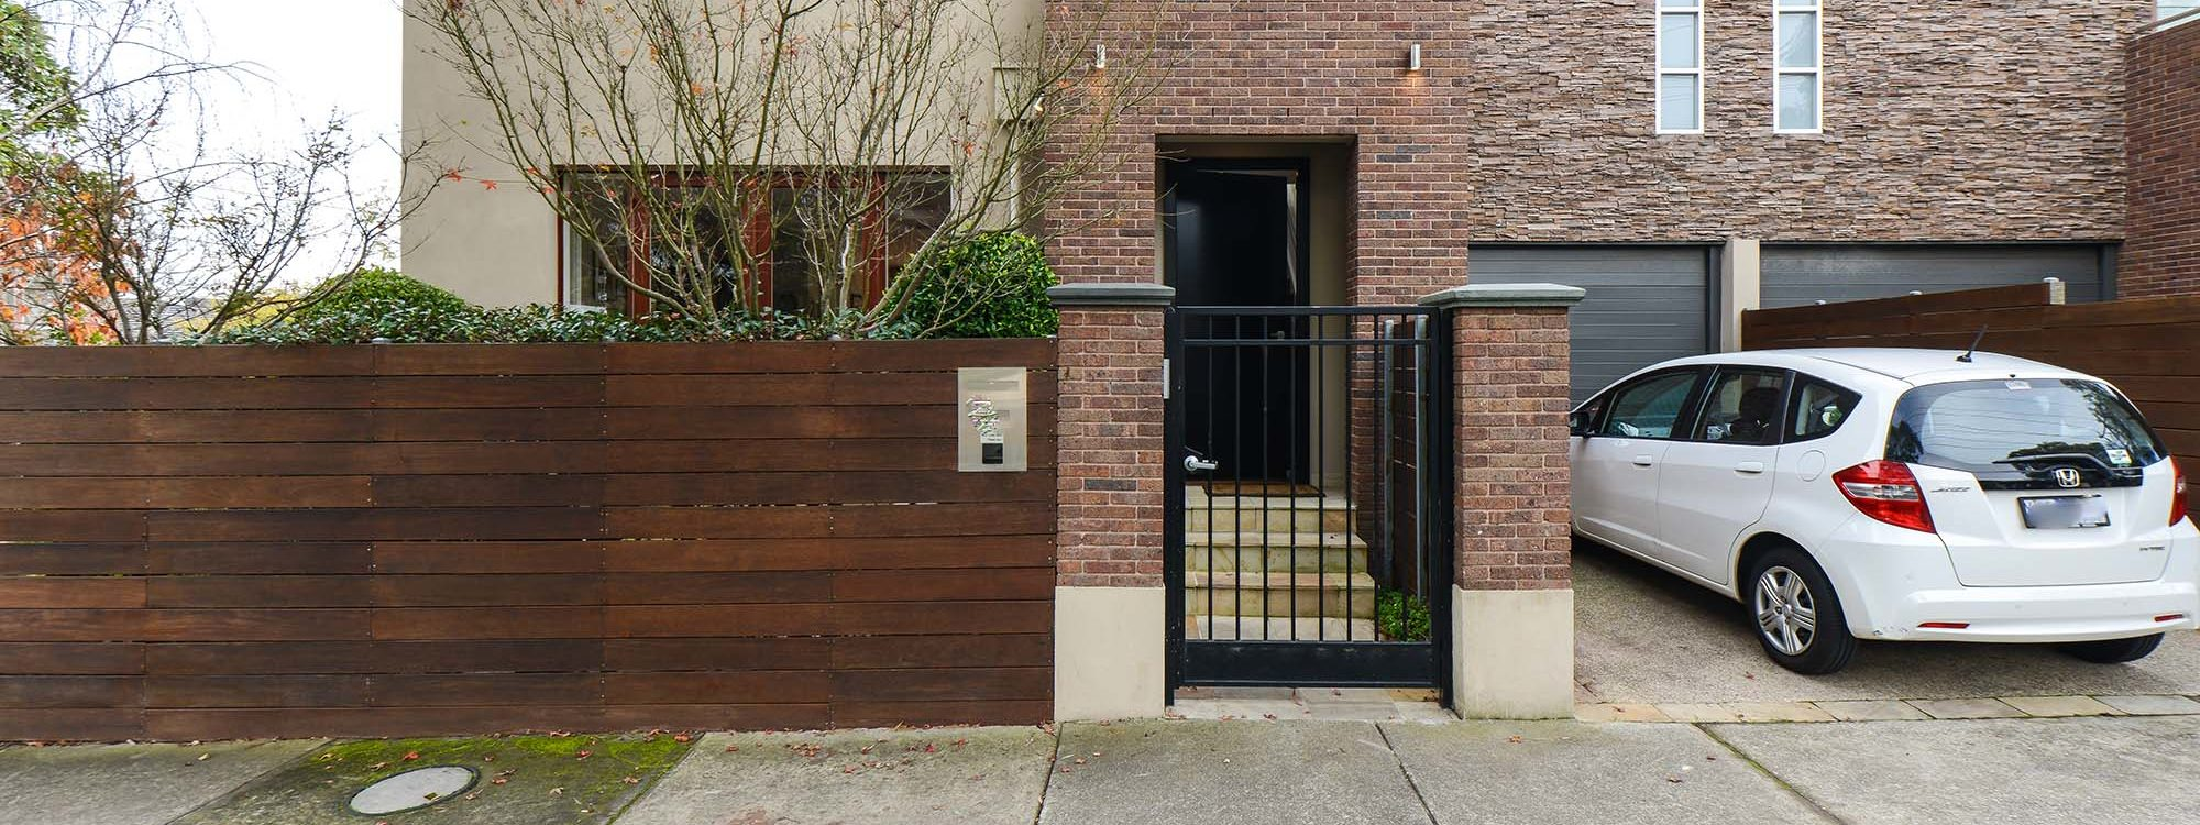 Maple on Kent - Glen Iris - Property Entrance Garage